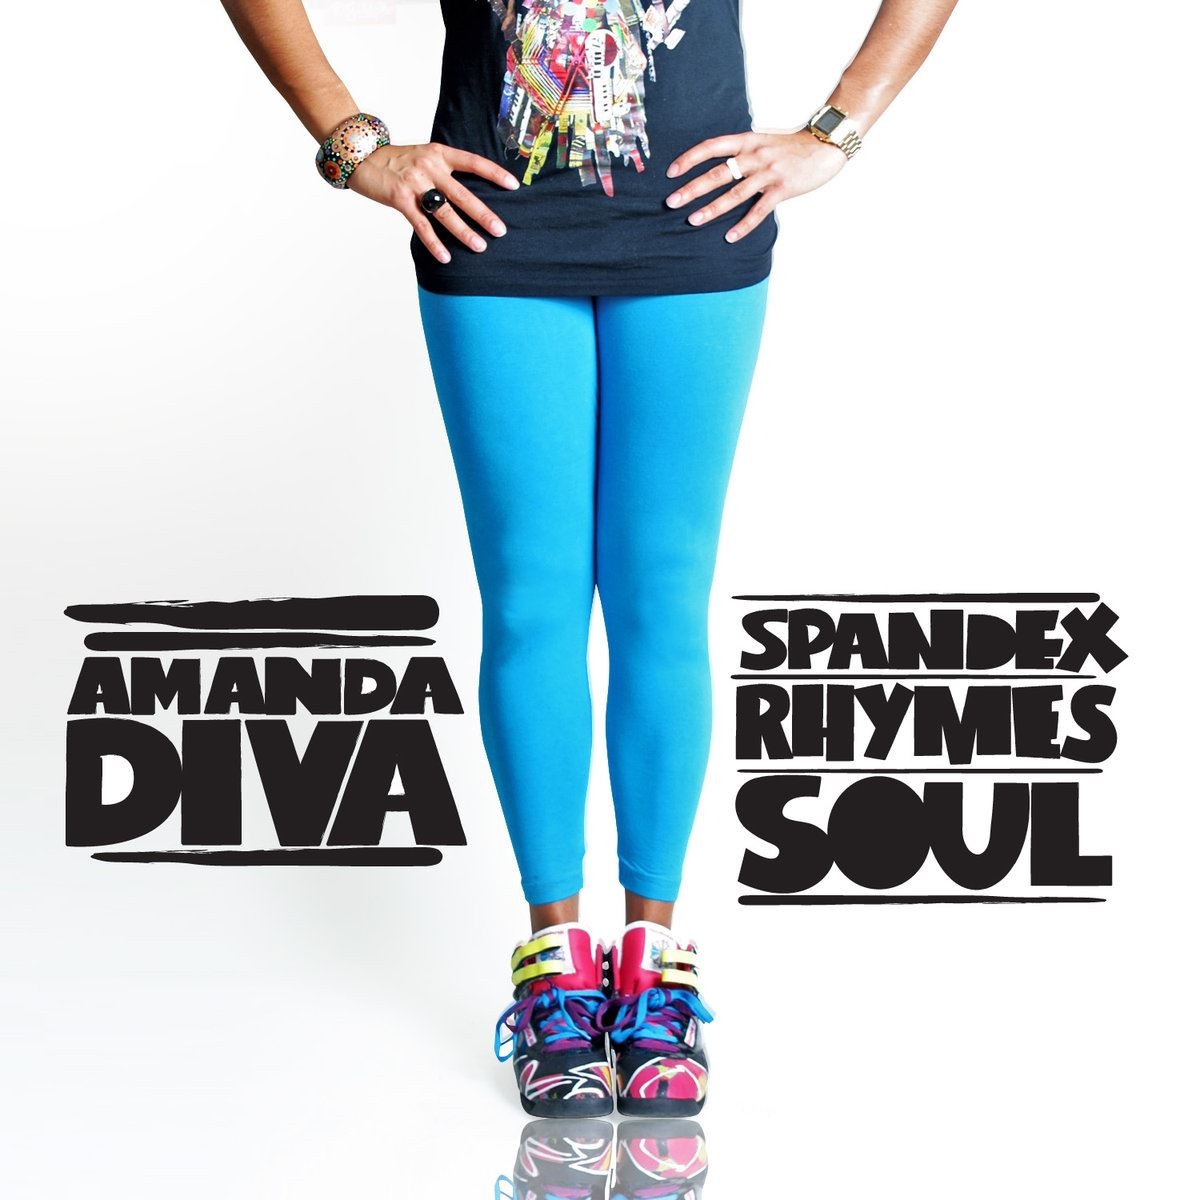 amandadiva_spandex